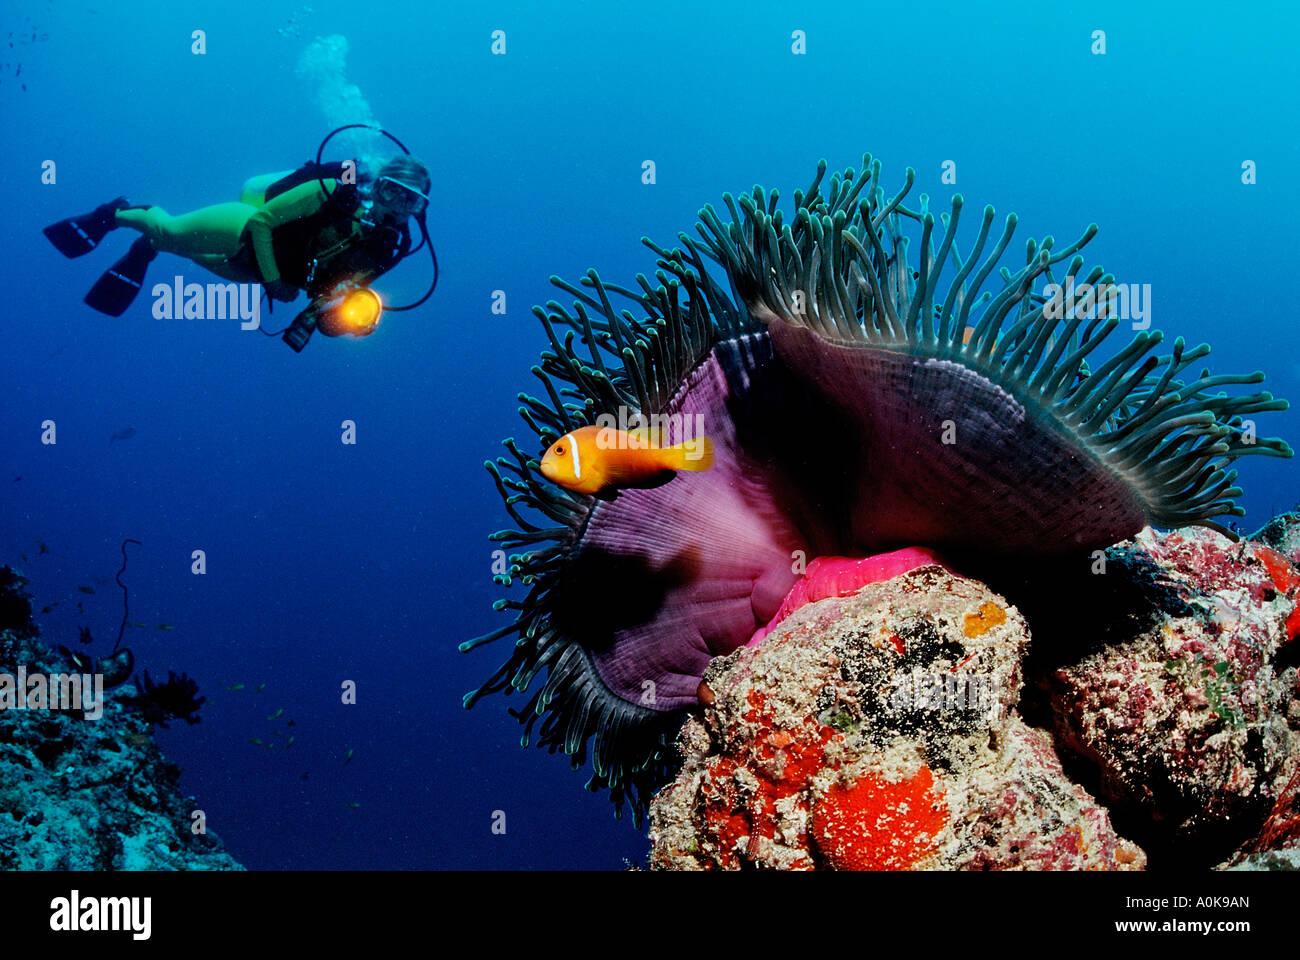 Diver observe Anemonefish Indian Ocean Maldives Island - Stock Image